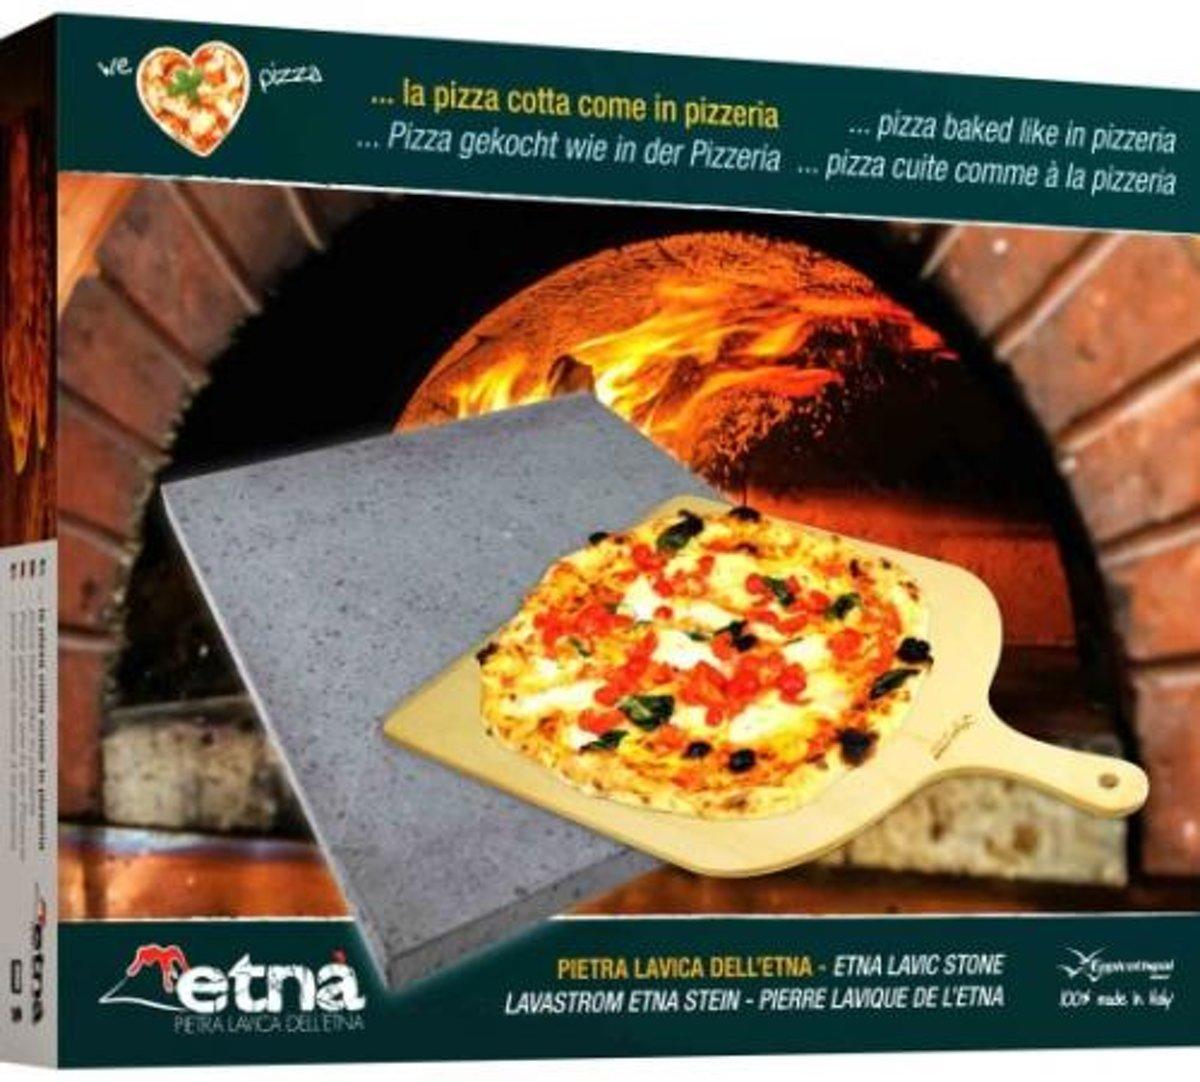 ETNA Pizza set - Eppicotispai kopen